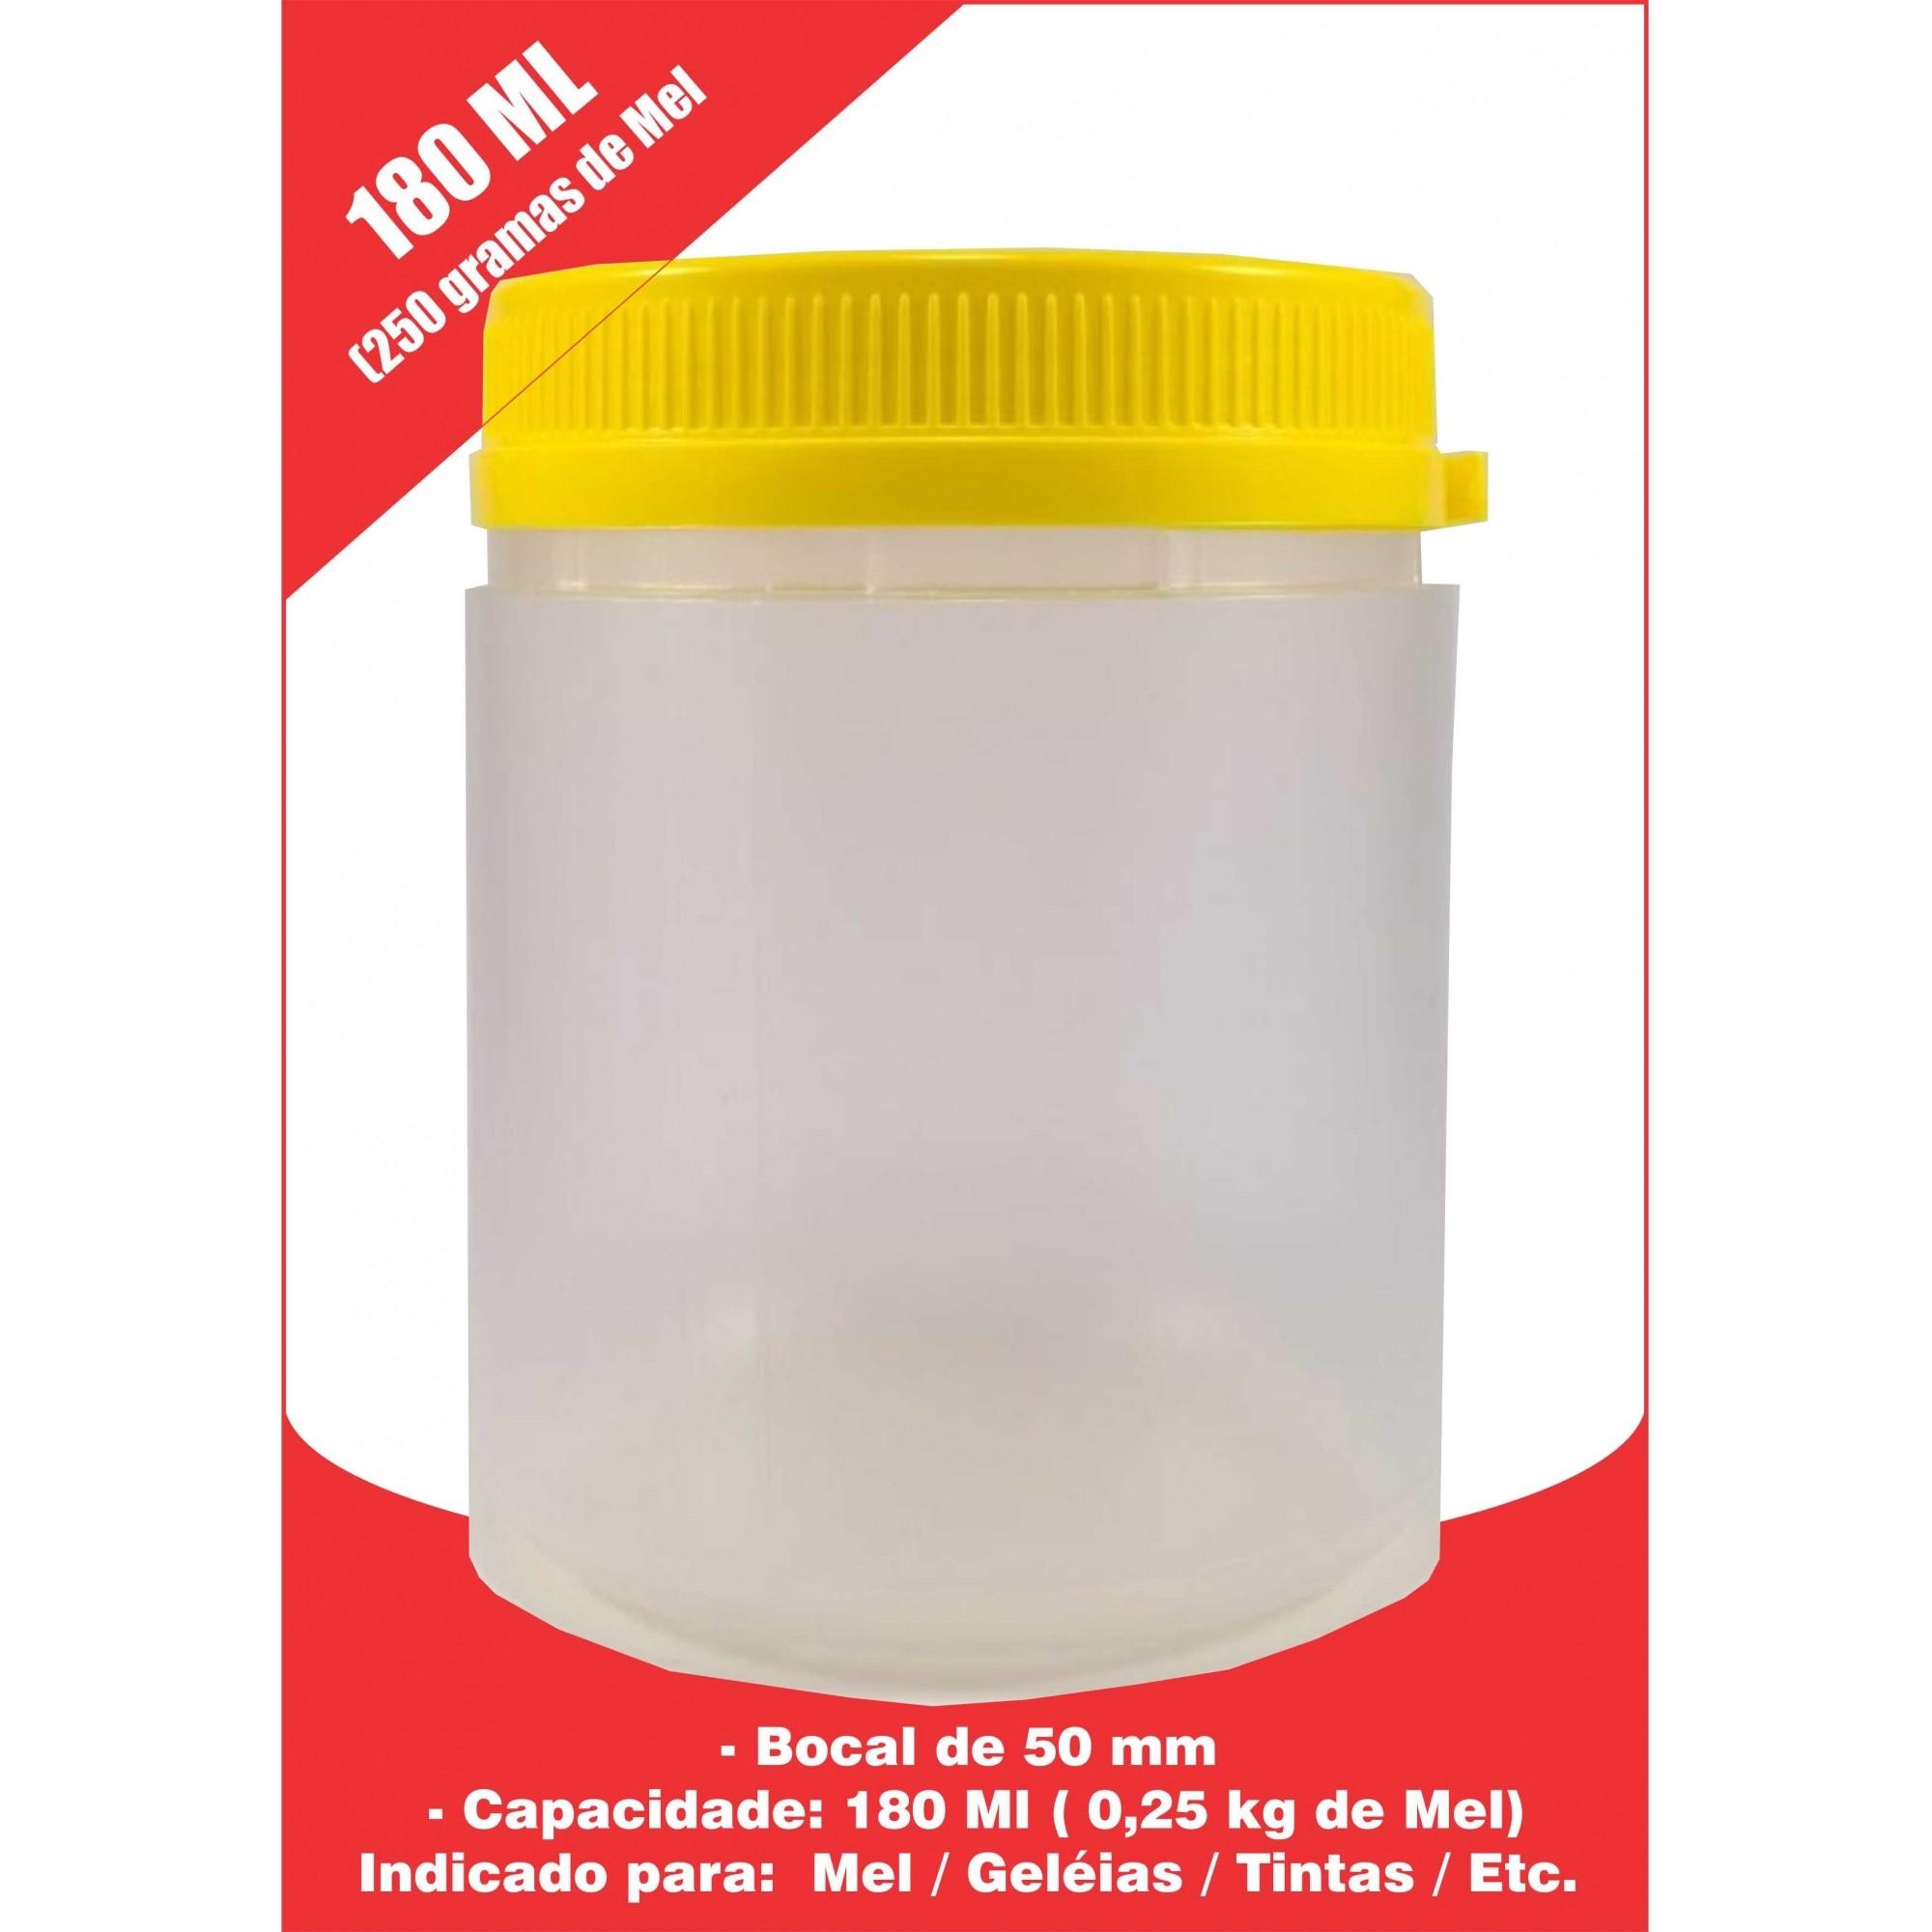 Pote Plástico Mel, Geléias, Alimentos, Tintas 180ml